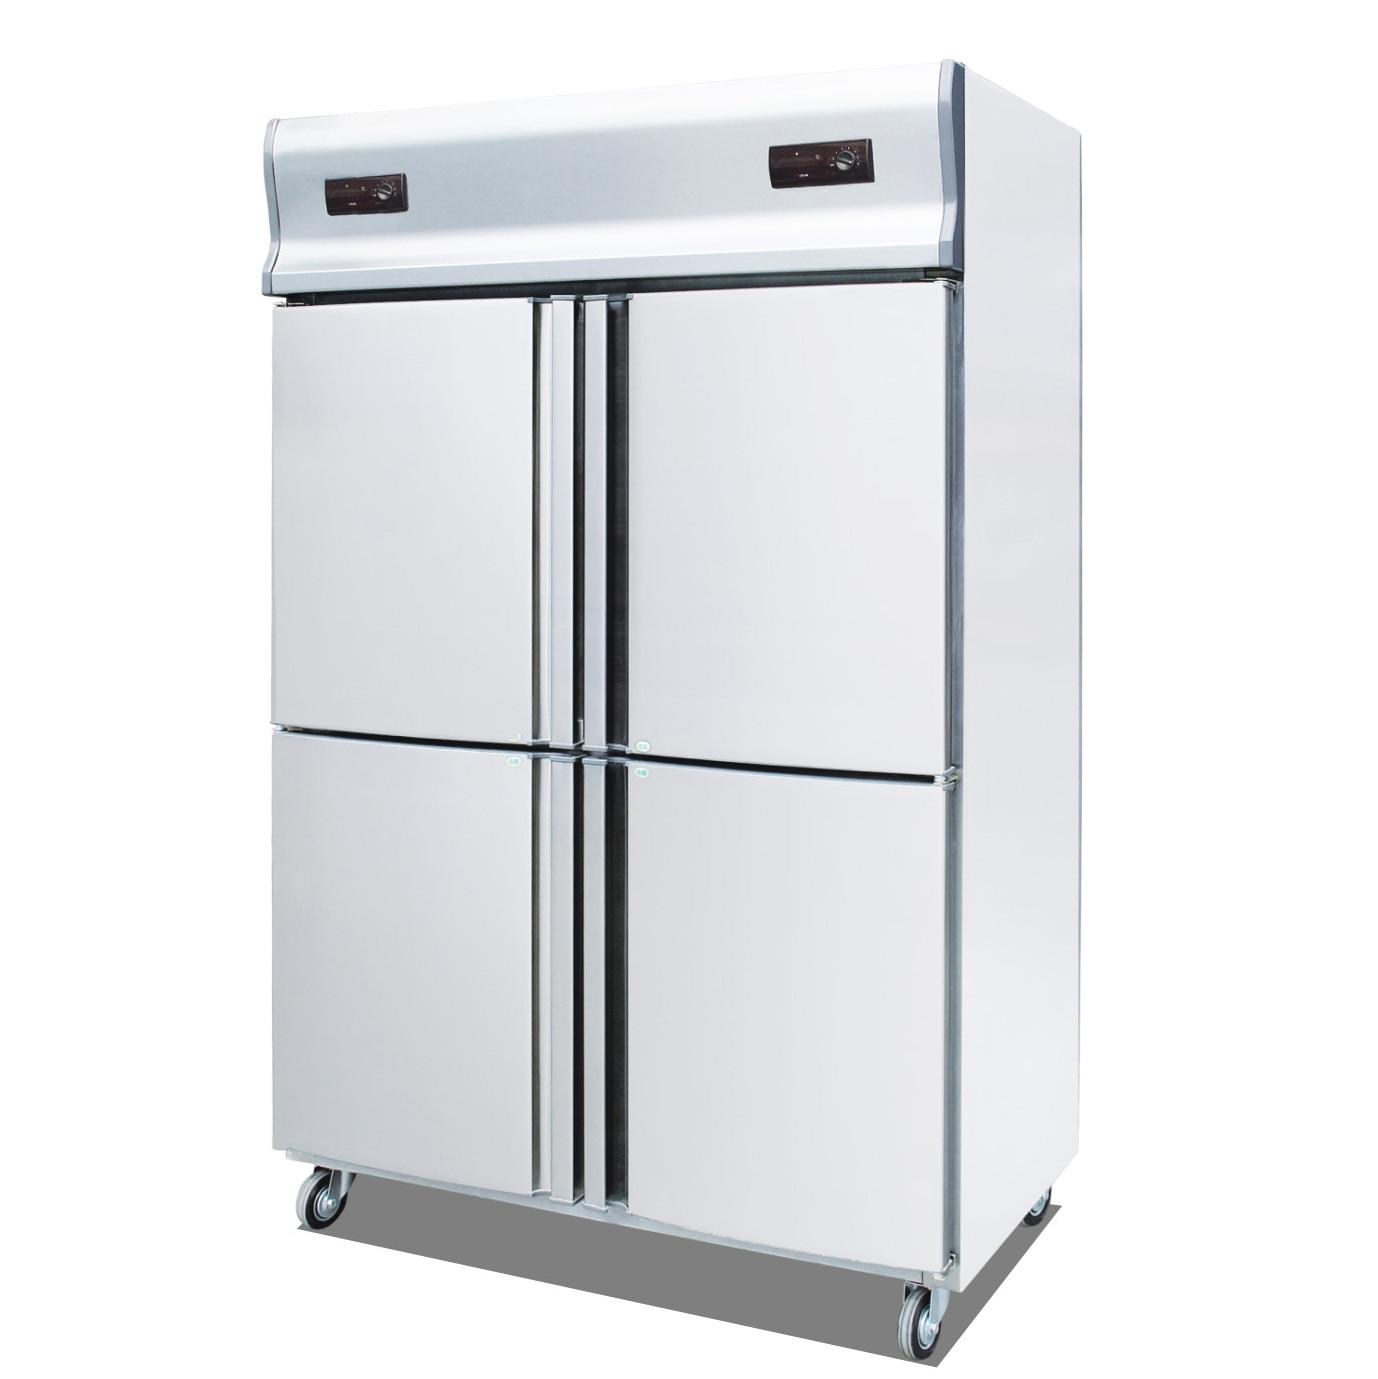 4 Door Vertical Cold Freezer, Kitchen Cabinet Showcases Stainless Steel Freezer